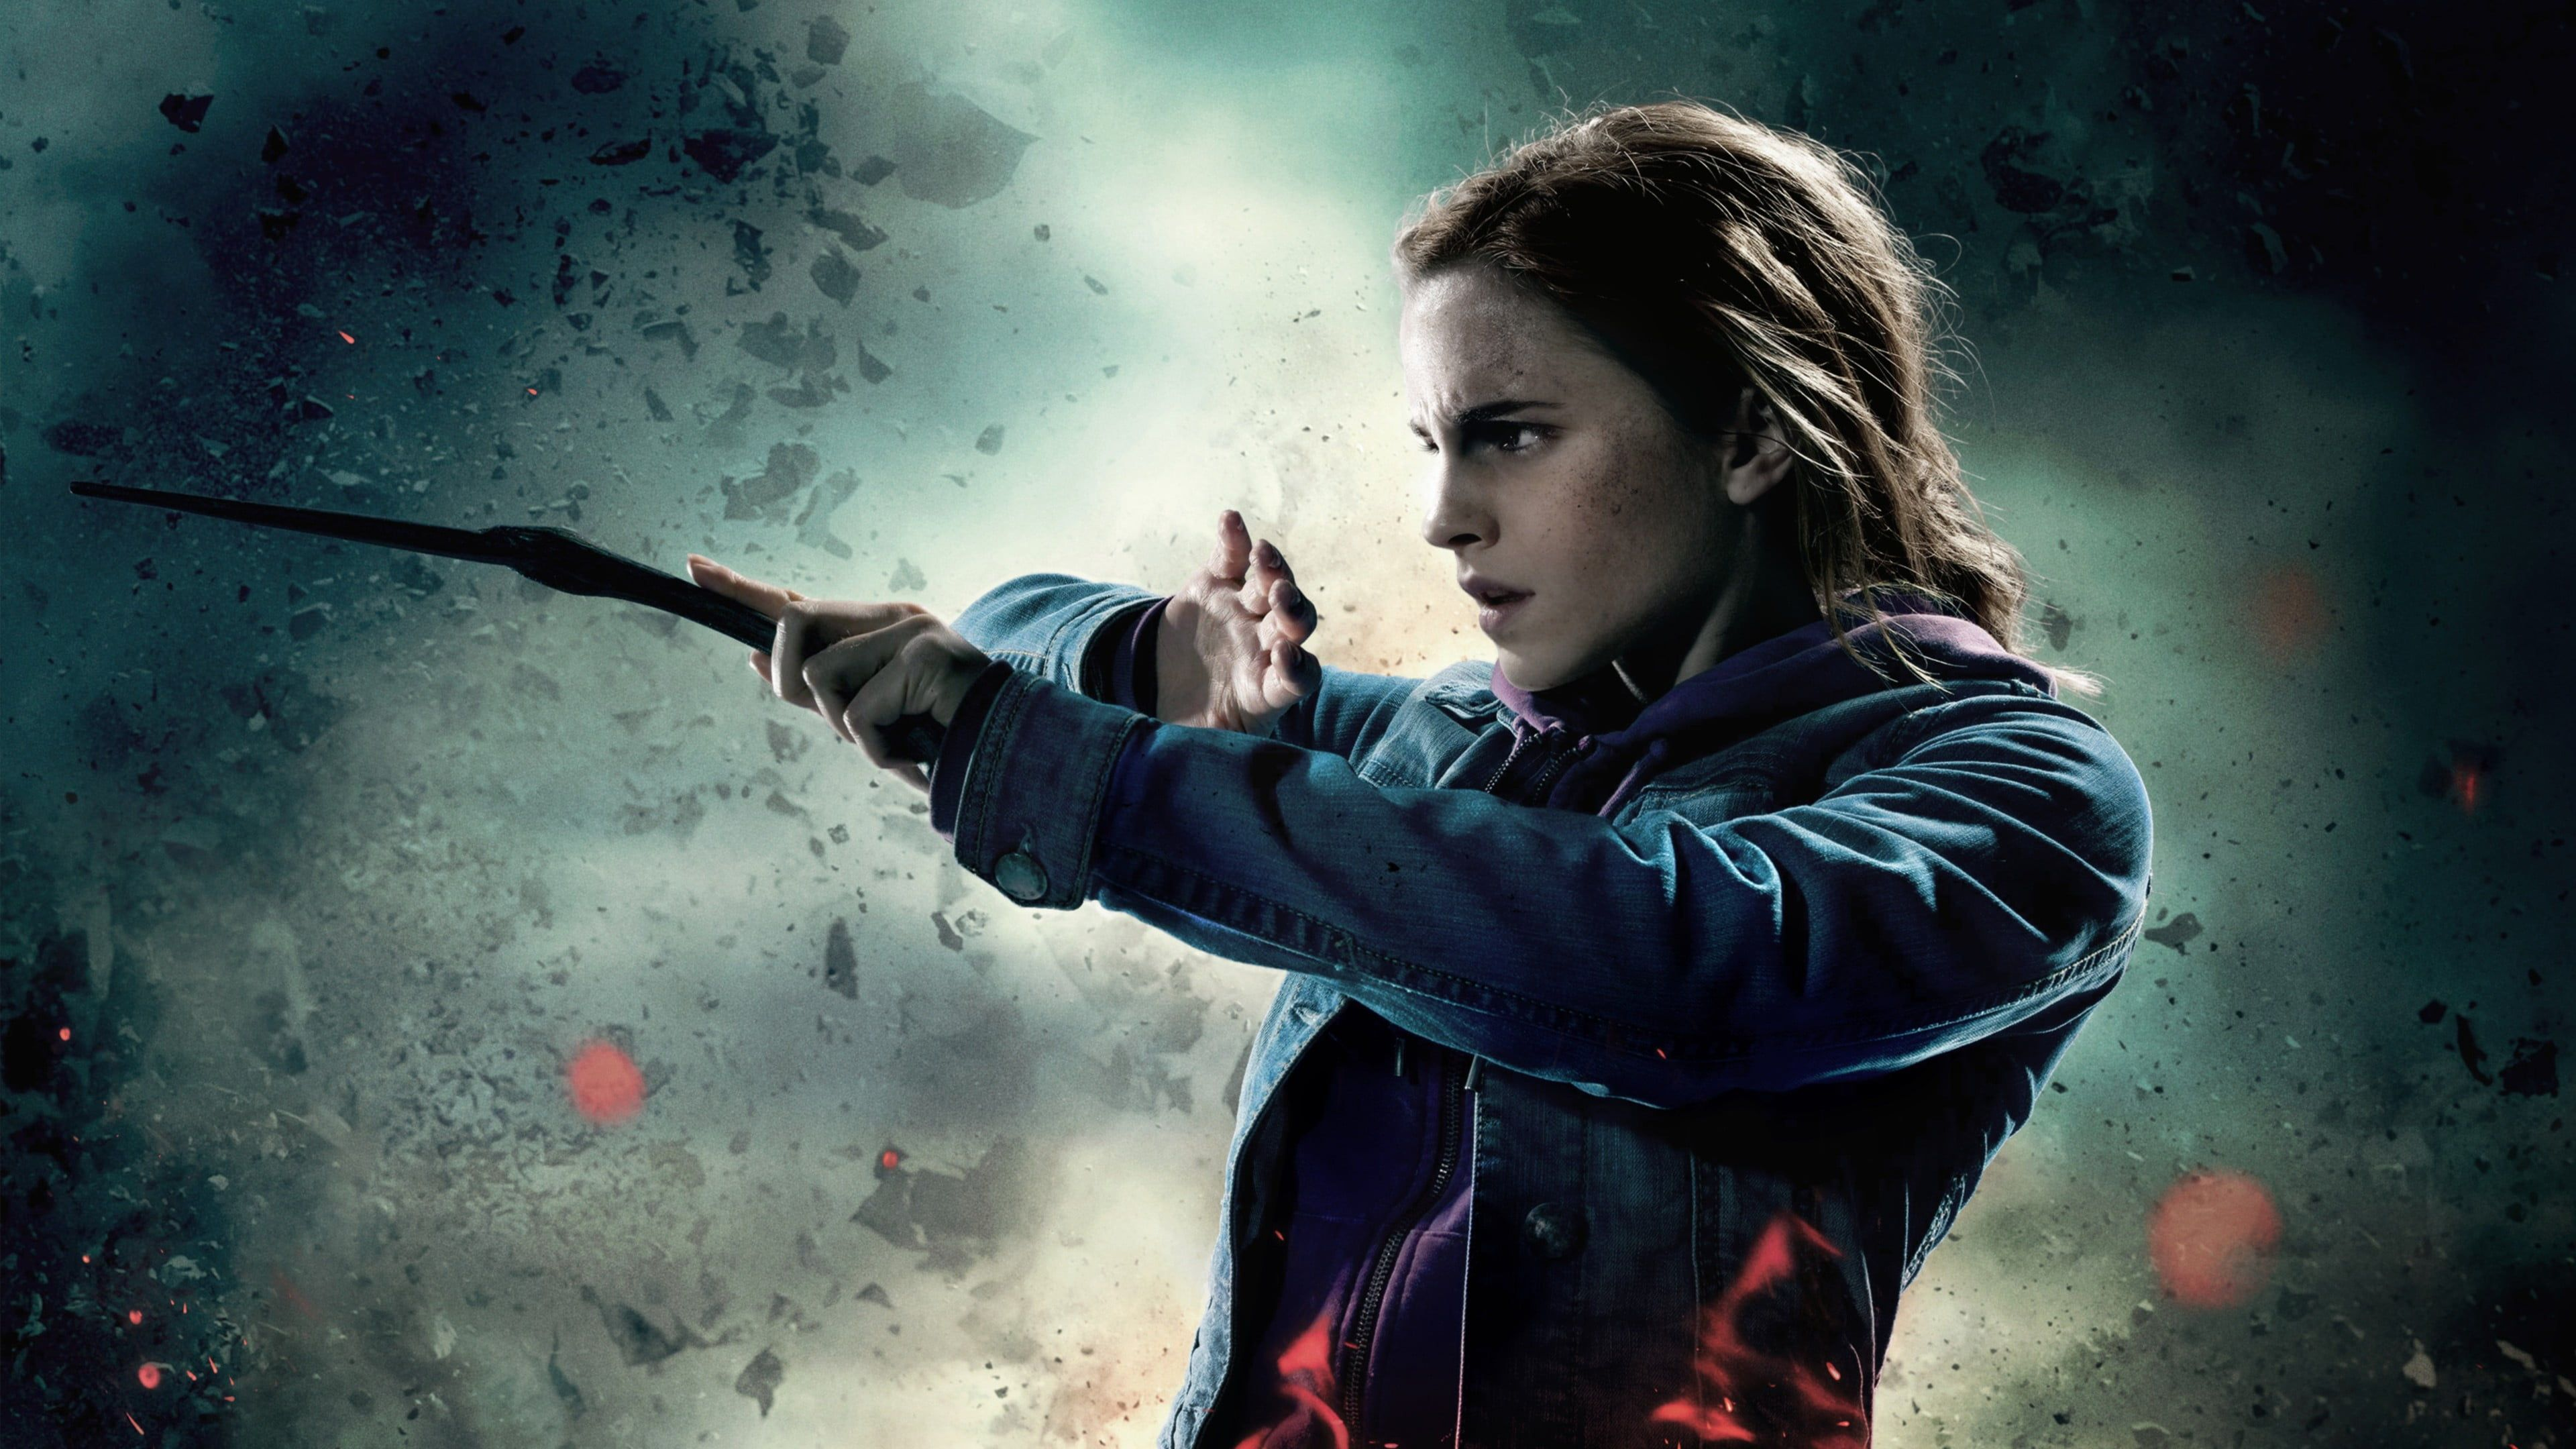 Harry Potter Hermoine Granger Hermione Granger Movies Harry Potter Emma Watson 4k Wallpap Harry Potter Hermione Wallpaper Harry Potter Fatos De Harry Potter